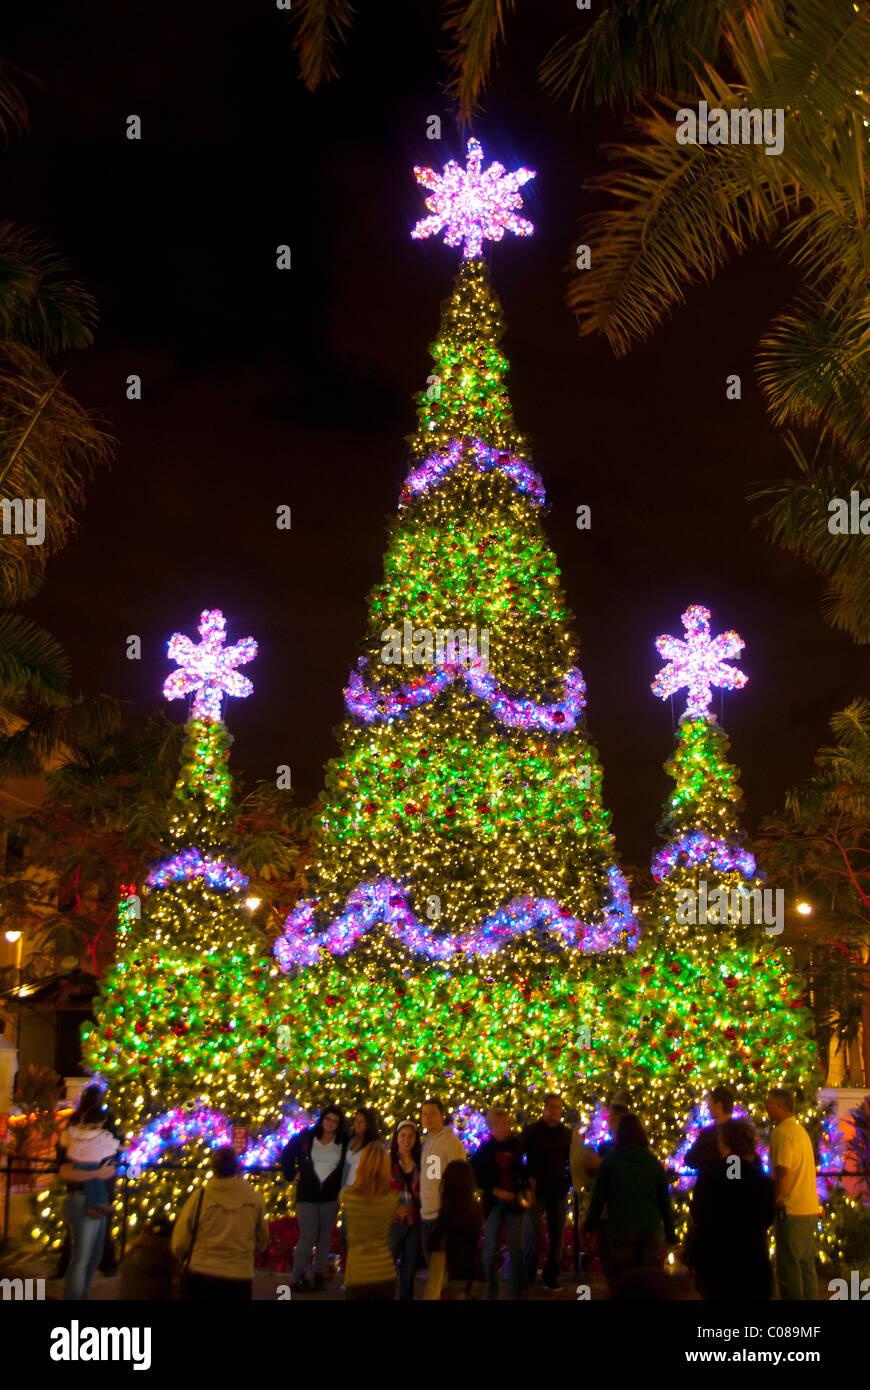 Large Outdoor Christmas Tree Stock Photos & Large Outdoor Christmas ...